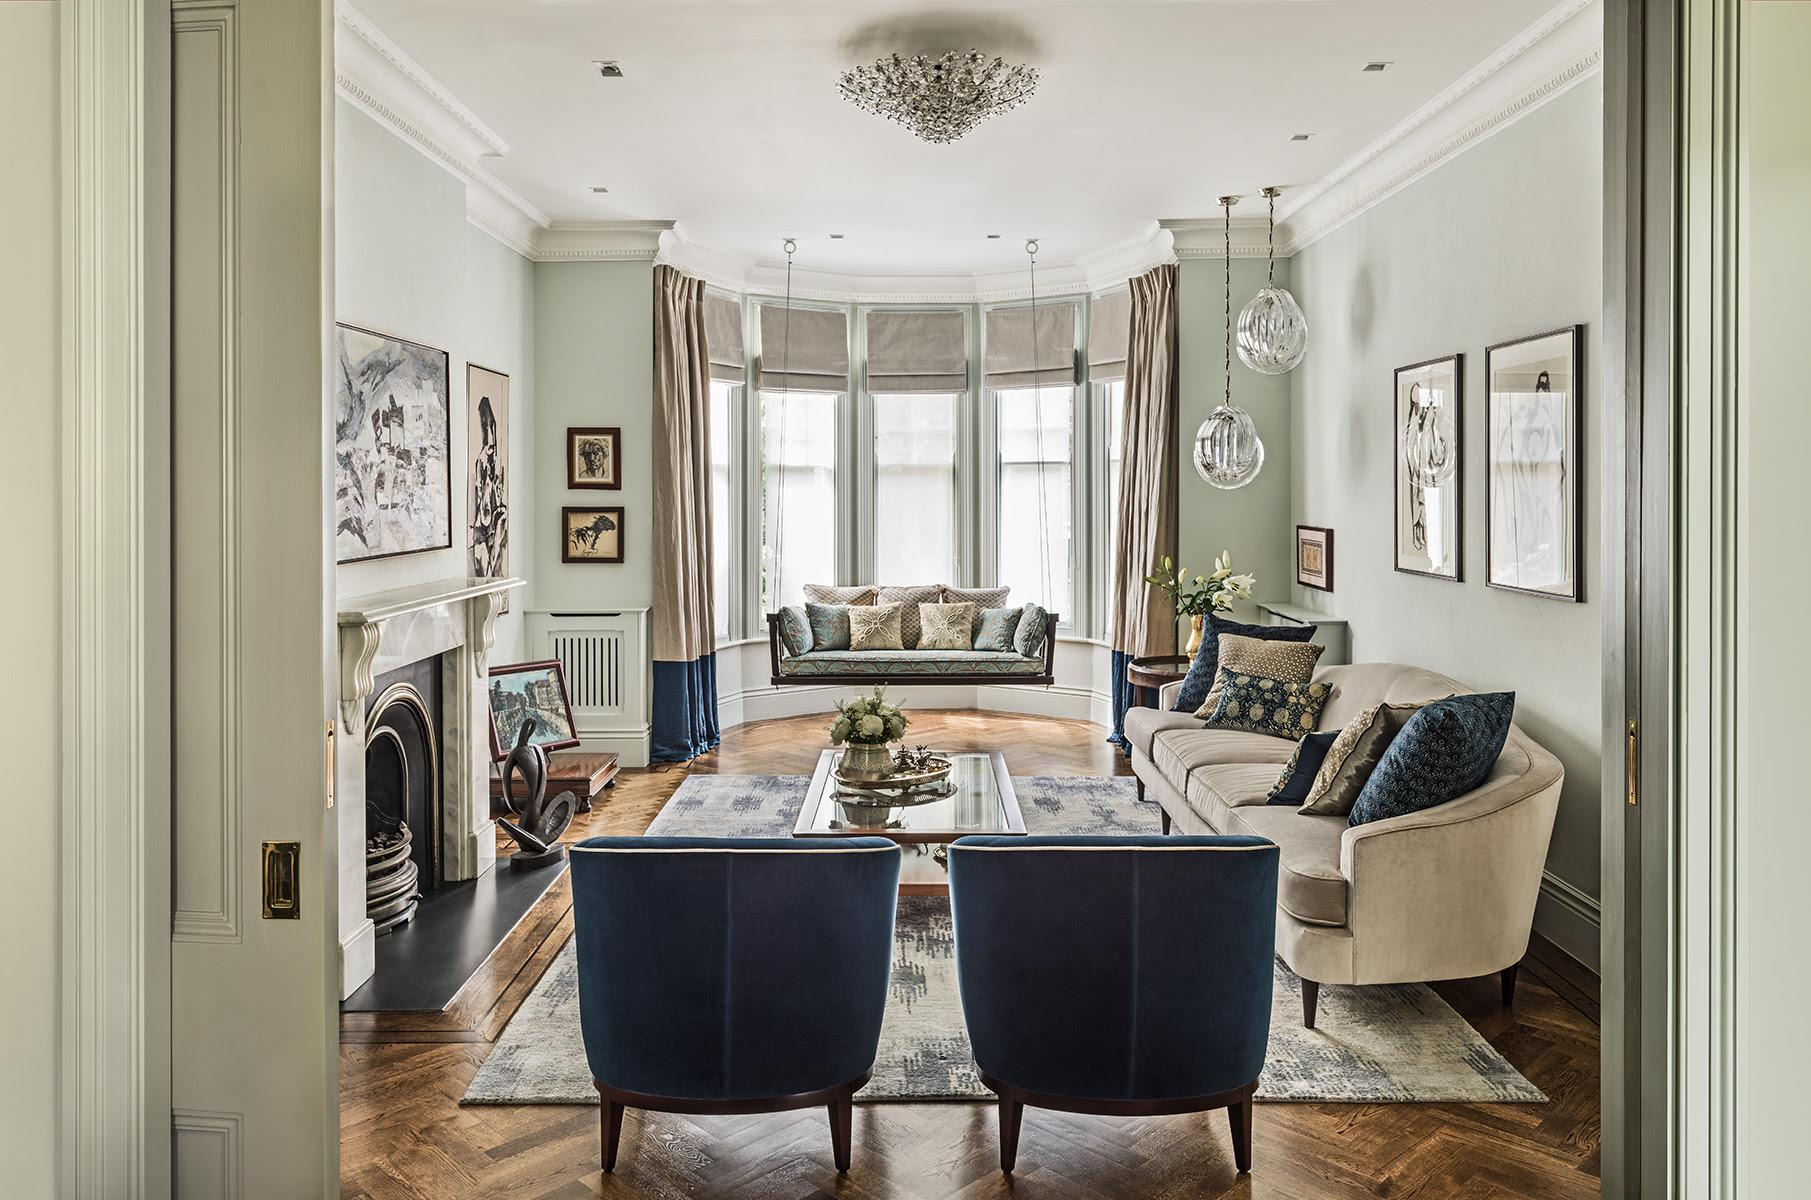 Living Room Essentials The Best Interior Remodeling Ideas 50 Ideas Lretbiri Wtsenates Info